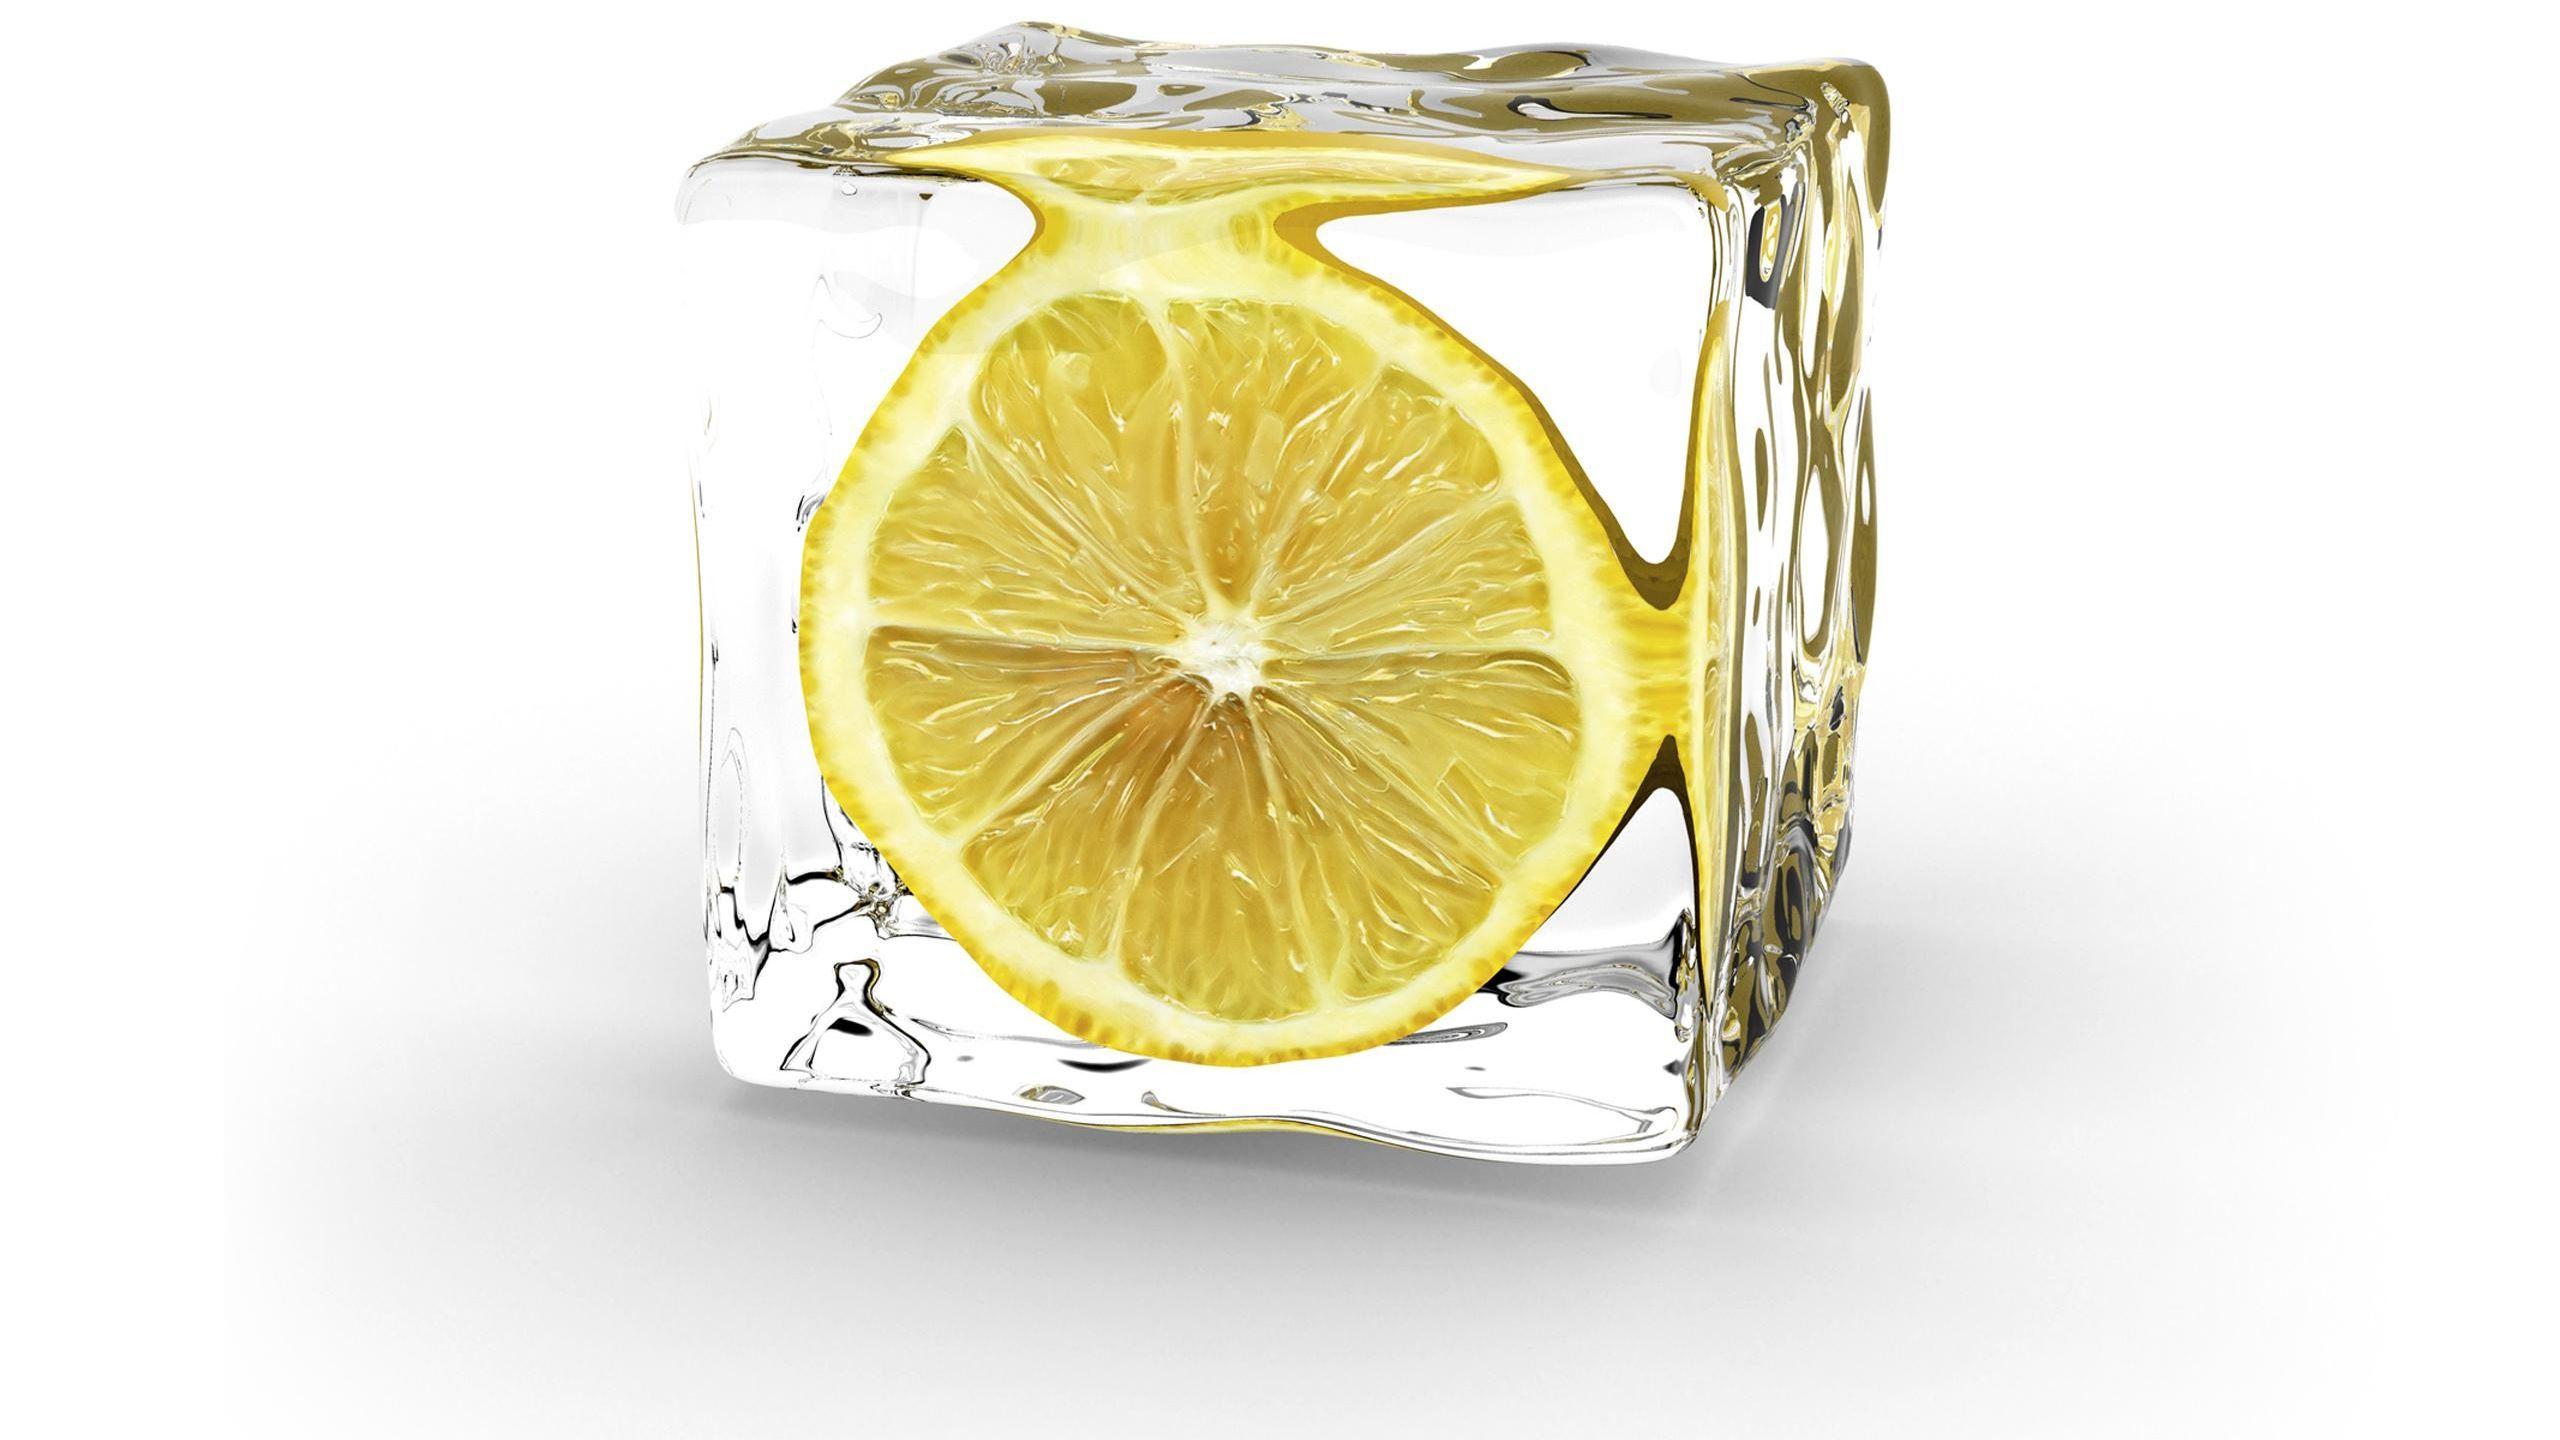 Lemon in ice Mac Wallpaper Download